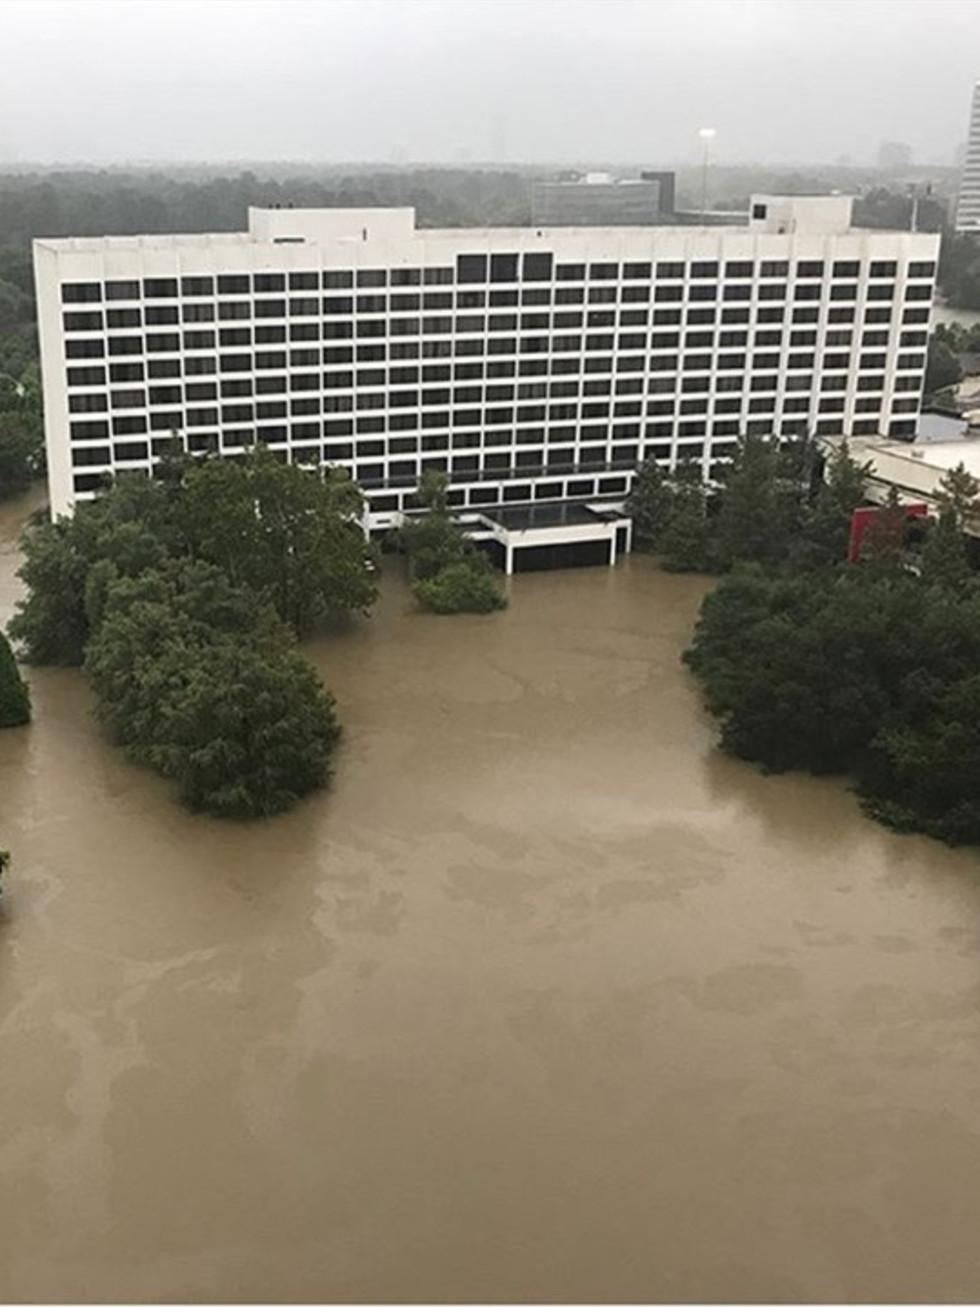 flooding at Houston Omni hotel from Hurricane Harvey